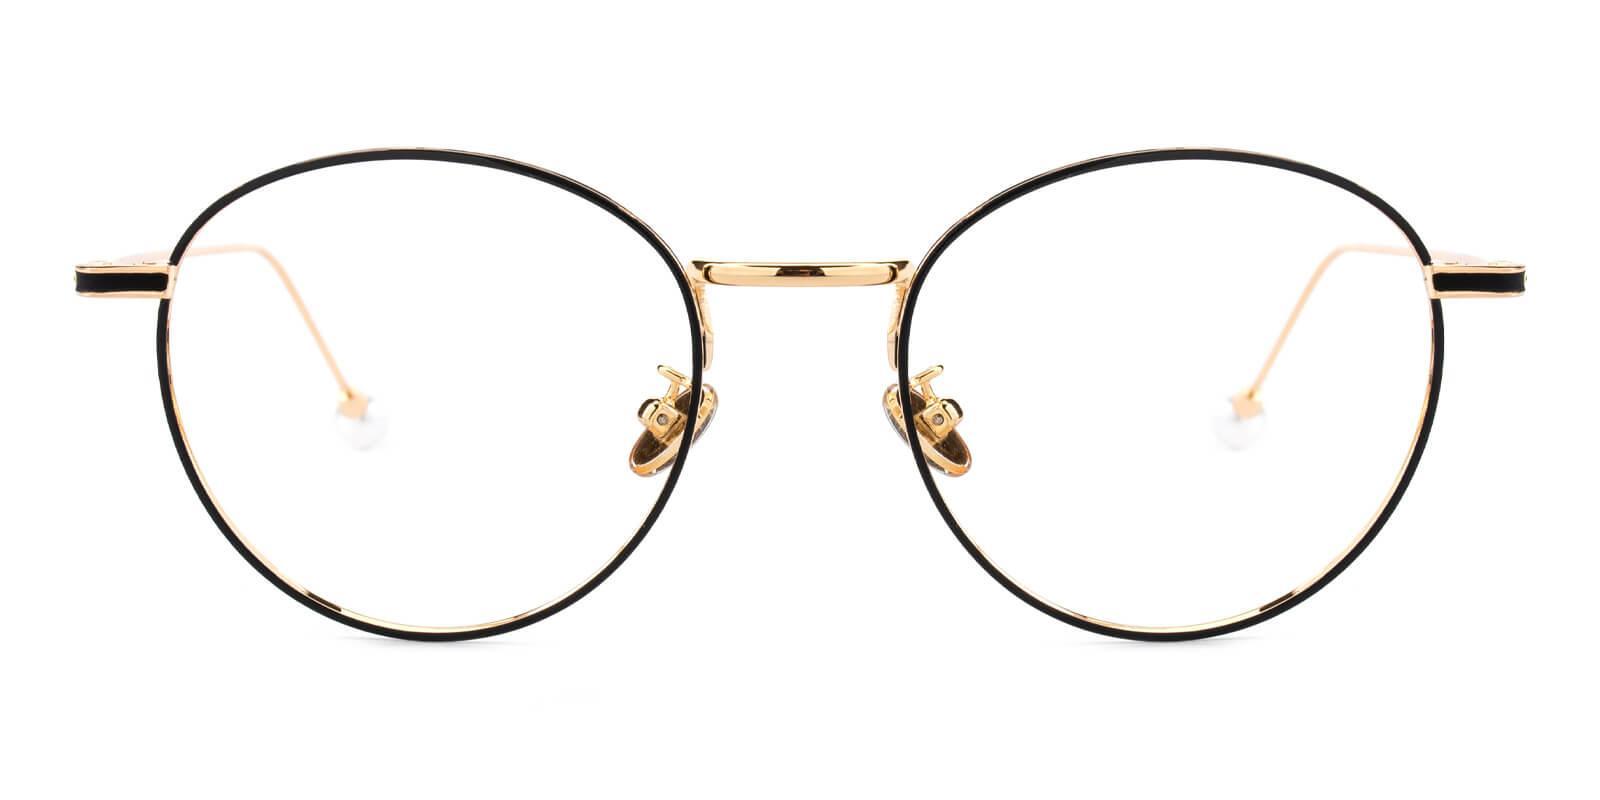 Frail-Pattern-Round-Metal-Eyeglasses-additional2